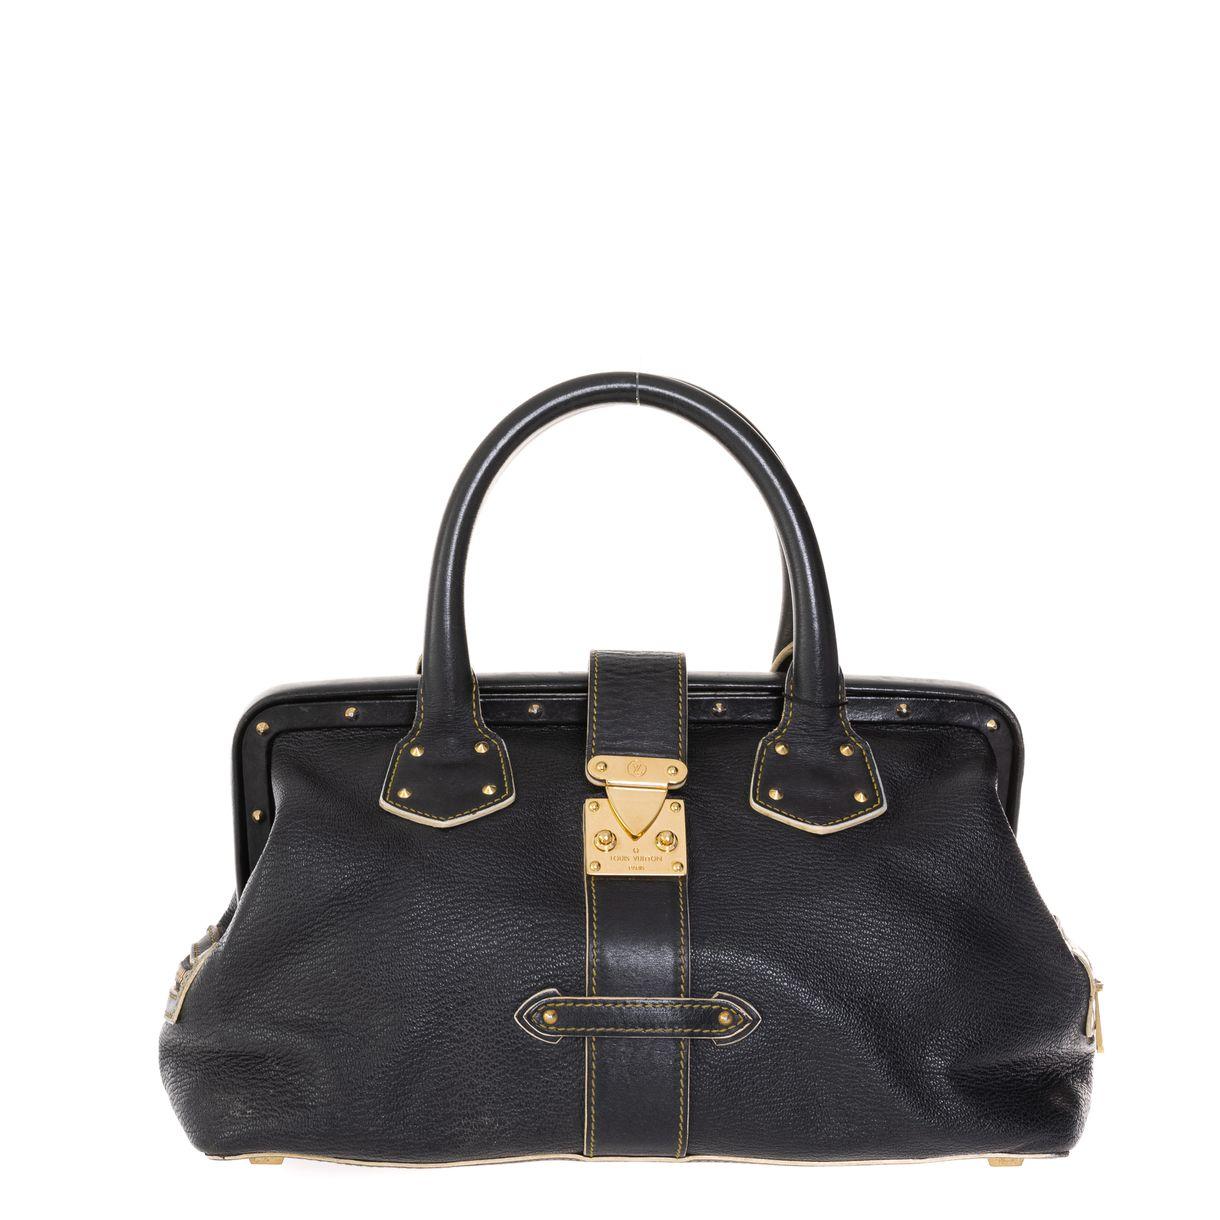 1824-Bolsa-Louis-Vuitton-Suhali-L-ingenieux-Preta-1